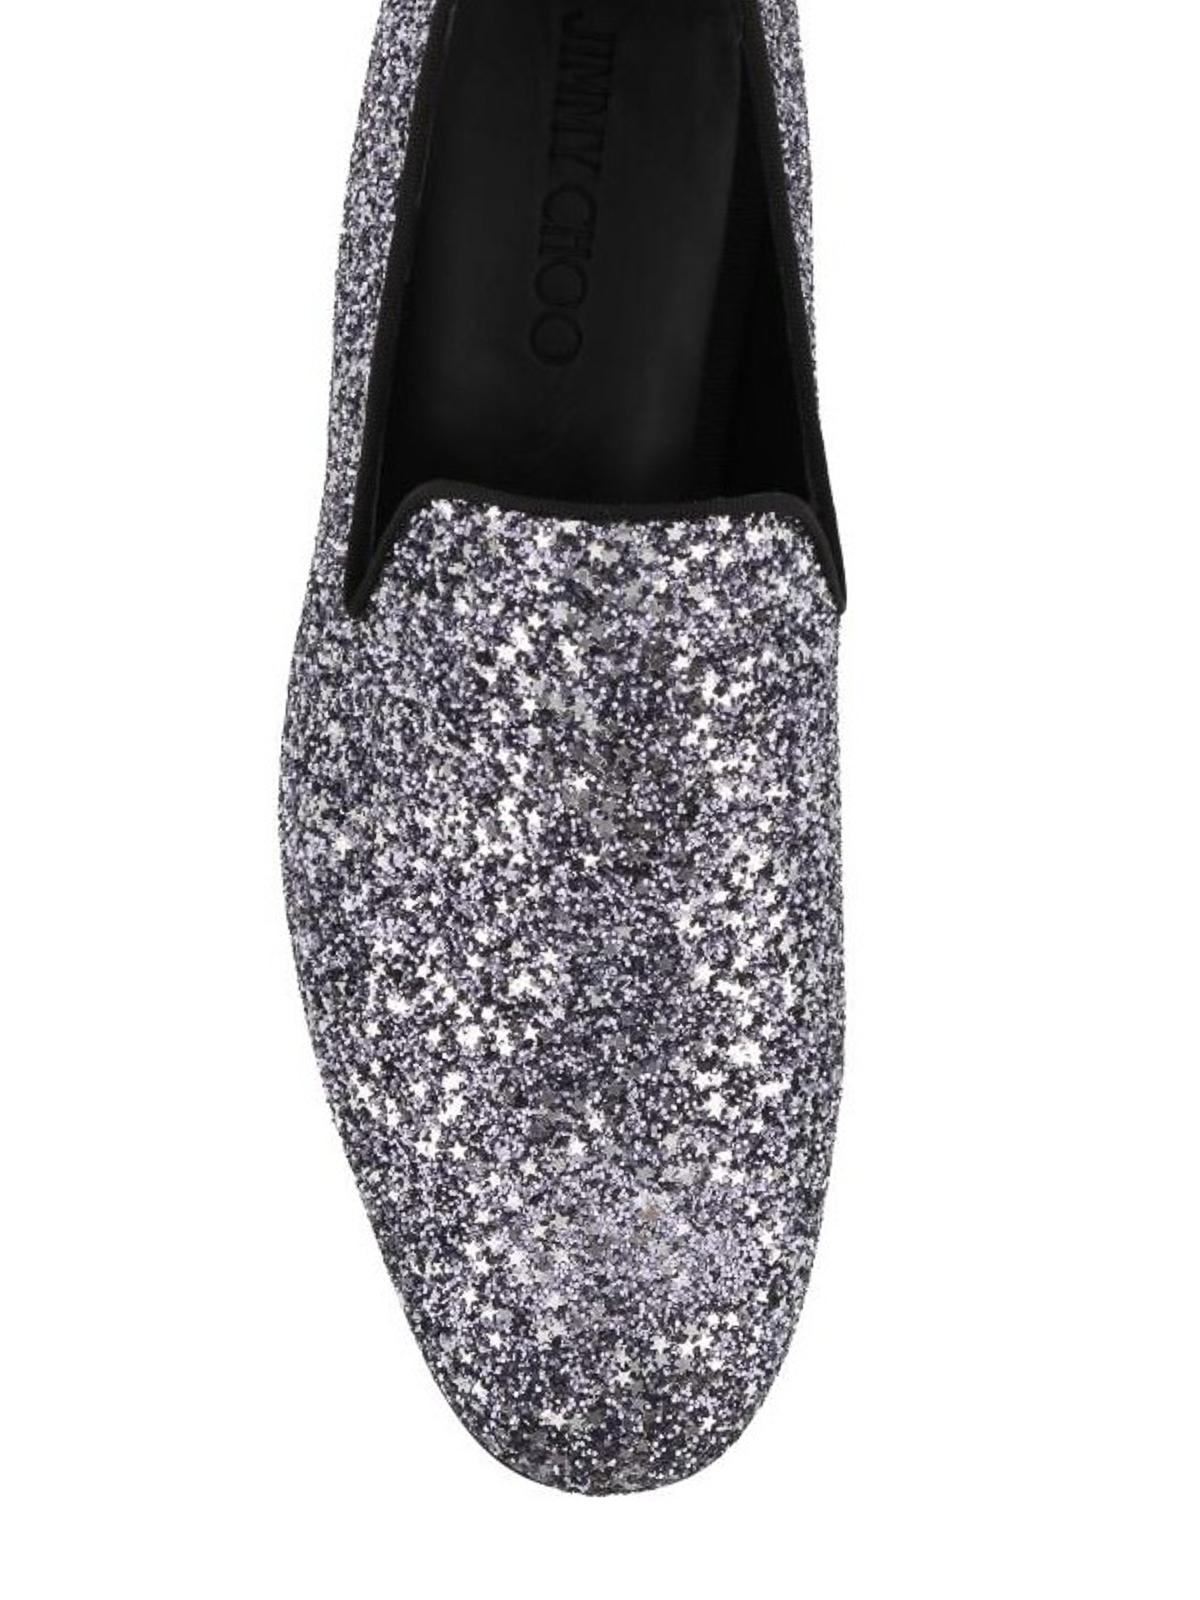 401e51715f69f iKRIX JIMMY CHOO: Loafers & Slippers - Marlo gunmetal coarse glitter shoes